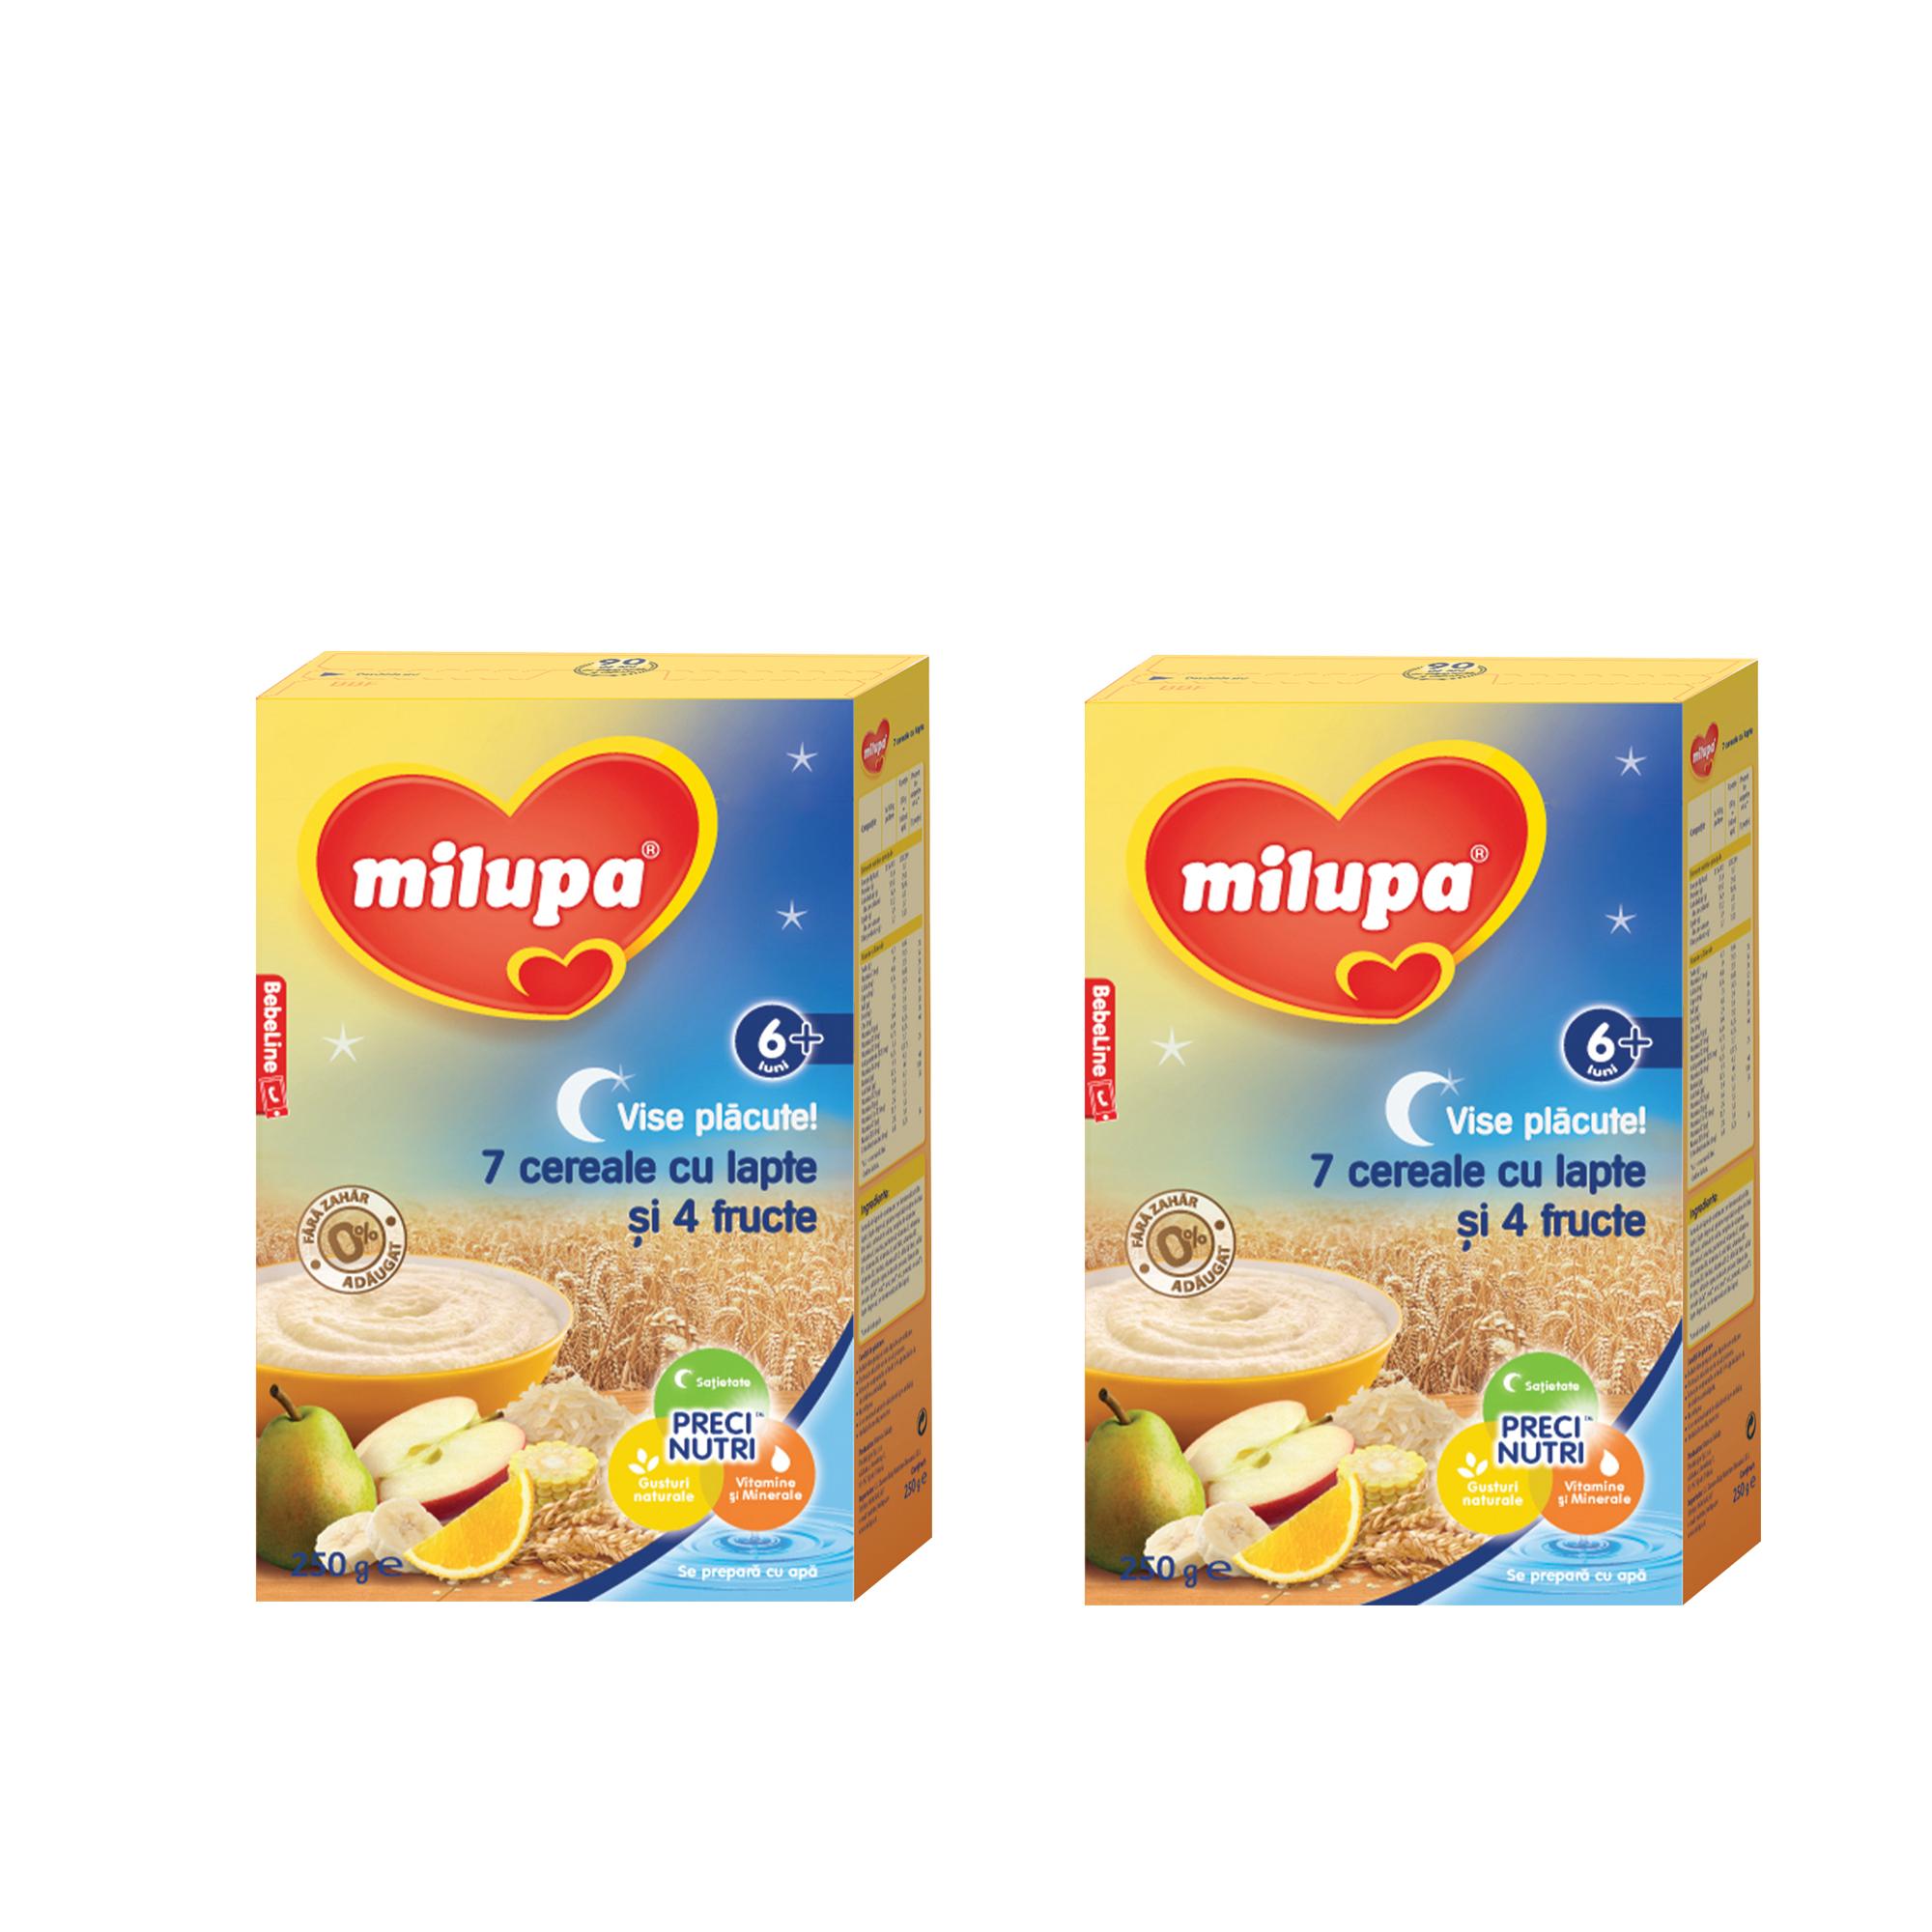 Pachet 2 x Cereale cu lapte Milupa, Vise Placute 7 cereale cu lapte si 4 fructe, 250g, 6luni+